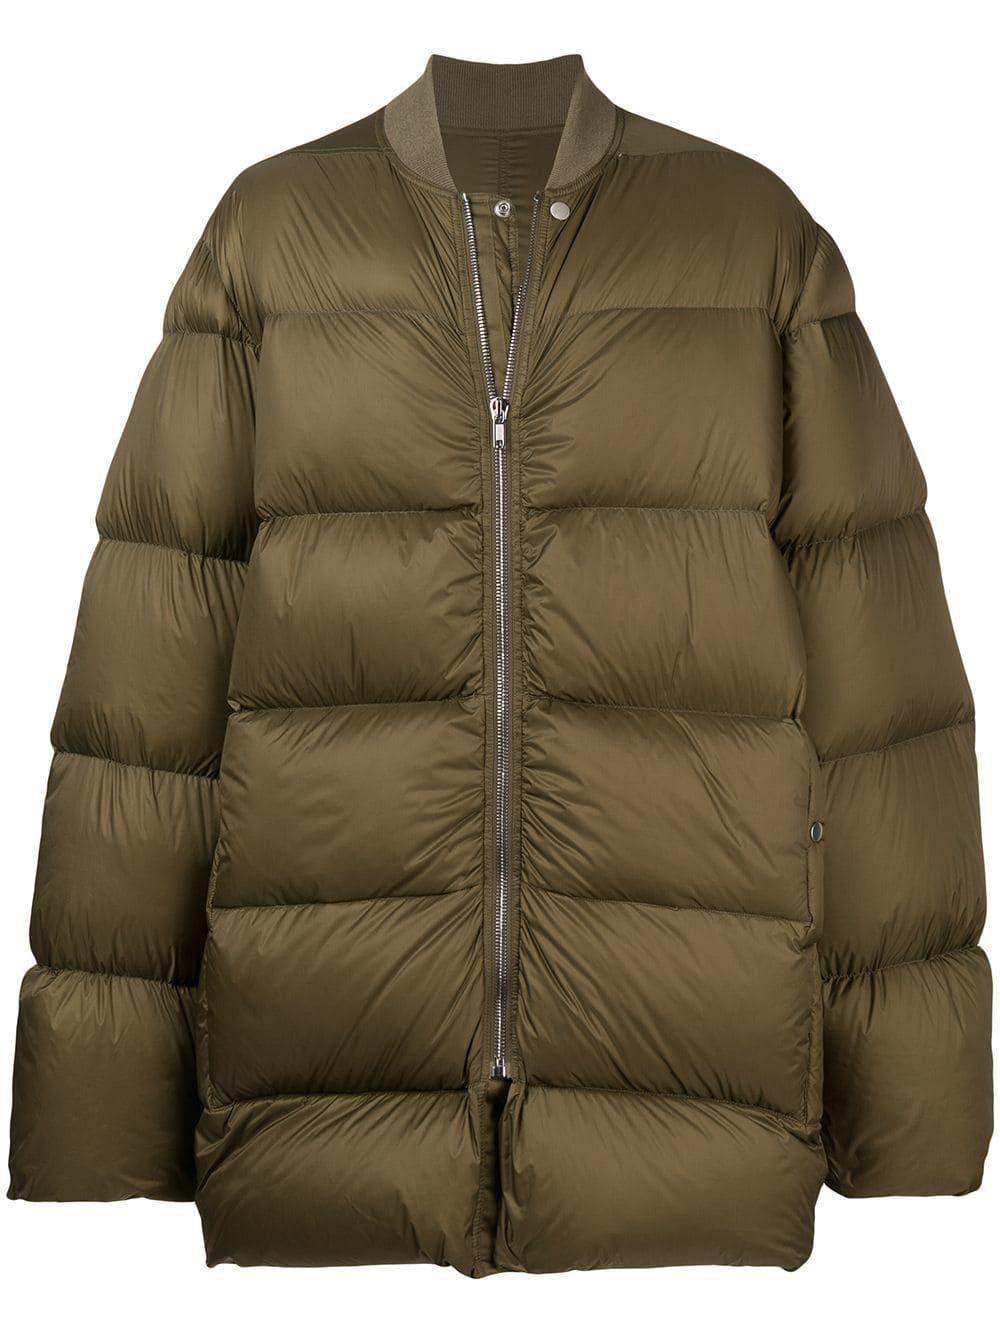 Rick Owens Oversized Puffer Jacket Green Modesens Green Jacket Oversized Puffer Jacket Jackets [ 1334 x 1000 Pixel ]